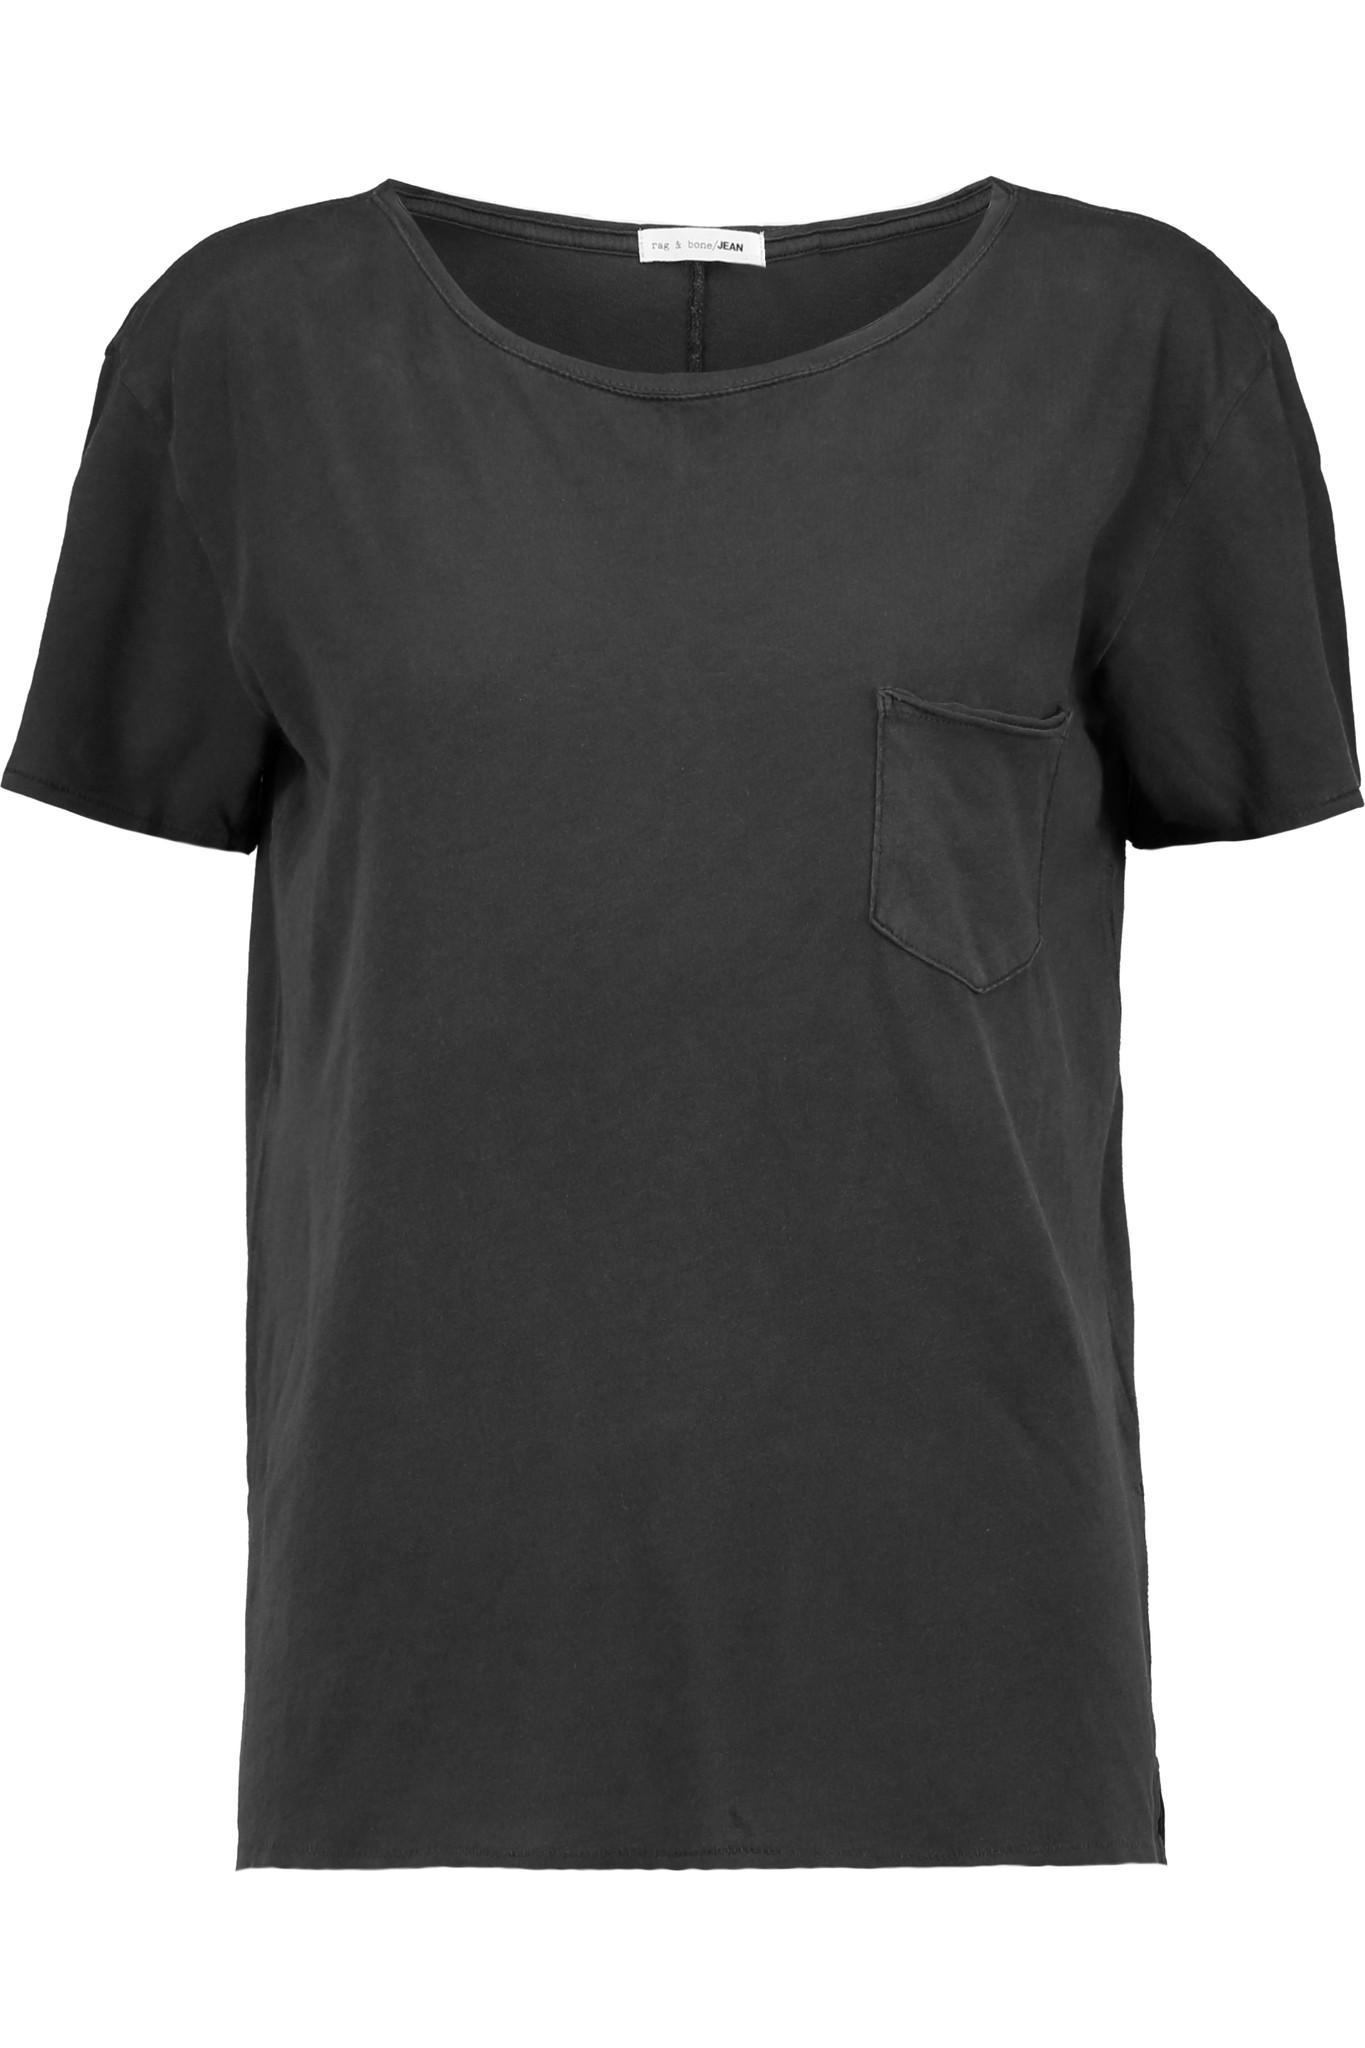 Rag bone x boyfriend cotton t shirt in black lyst for Rag and bone t shirts